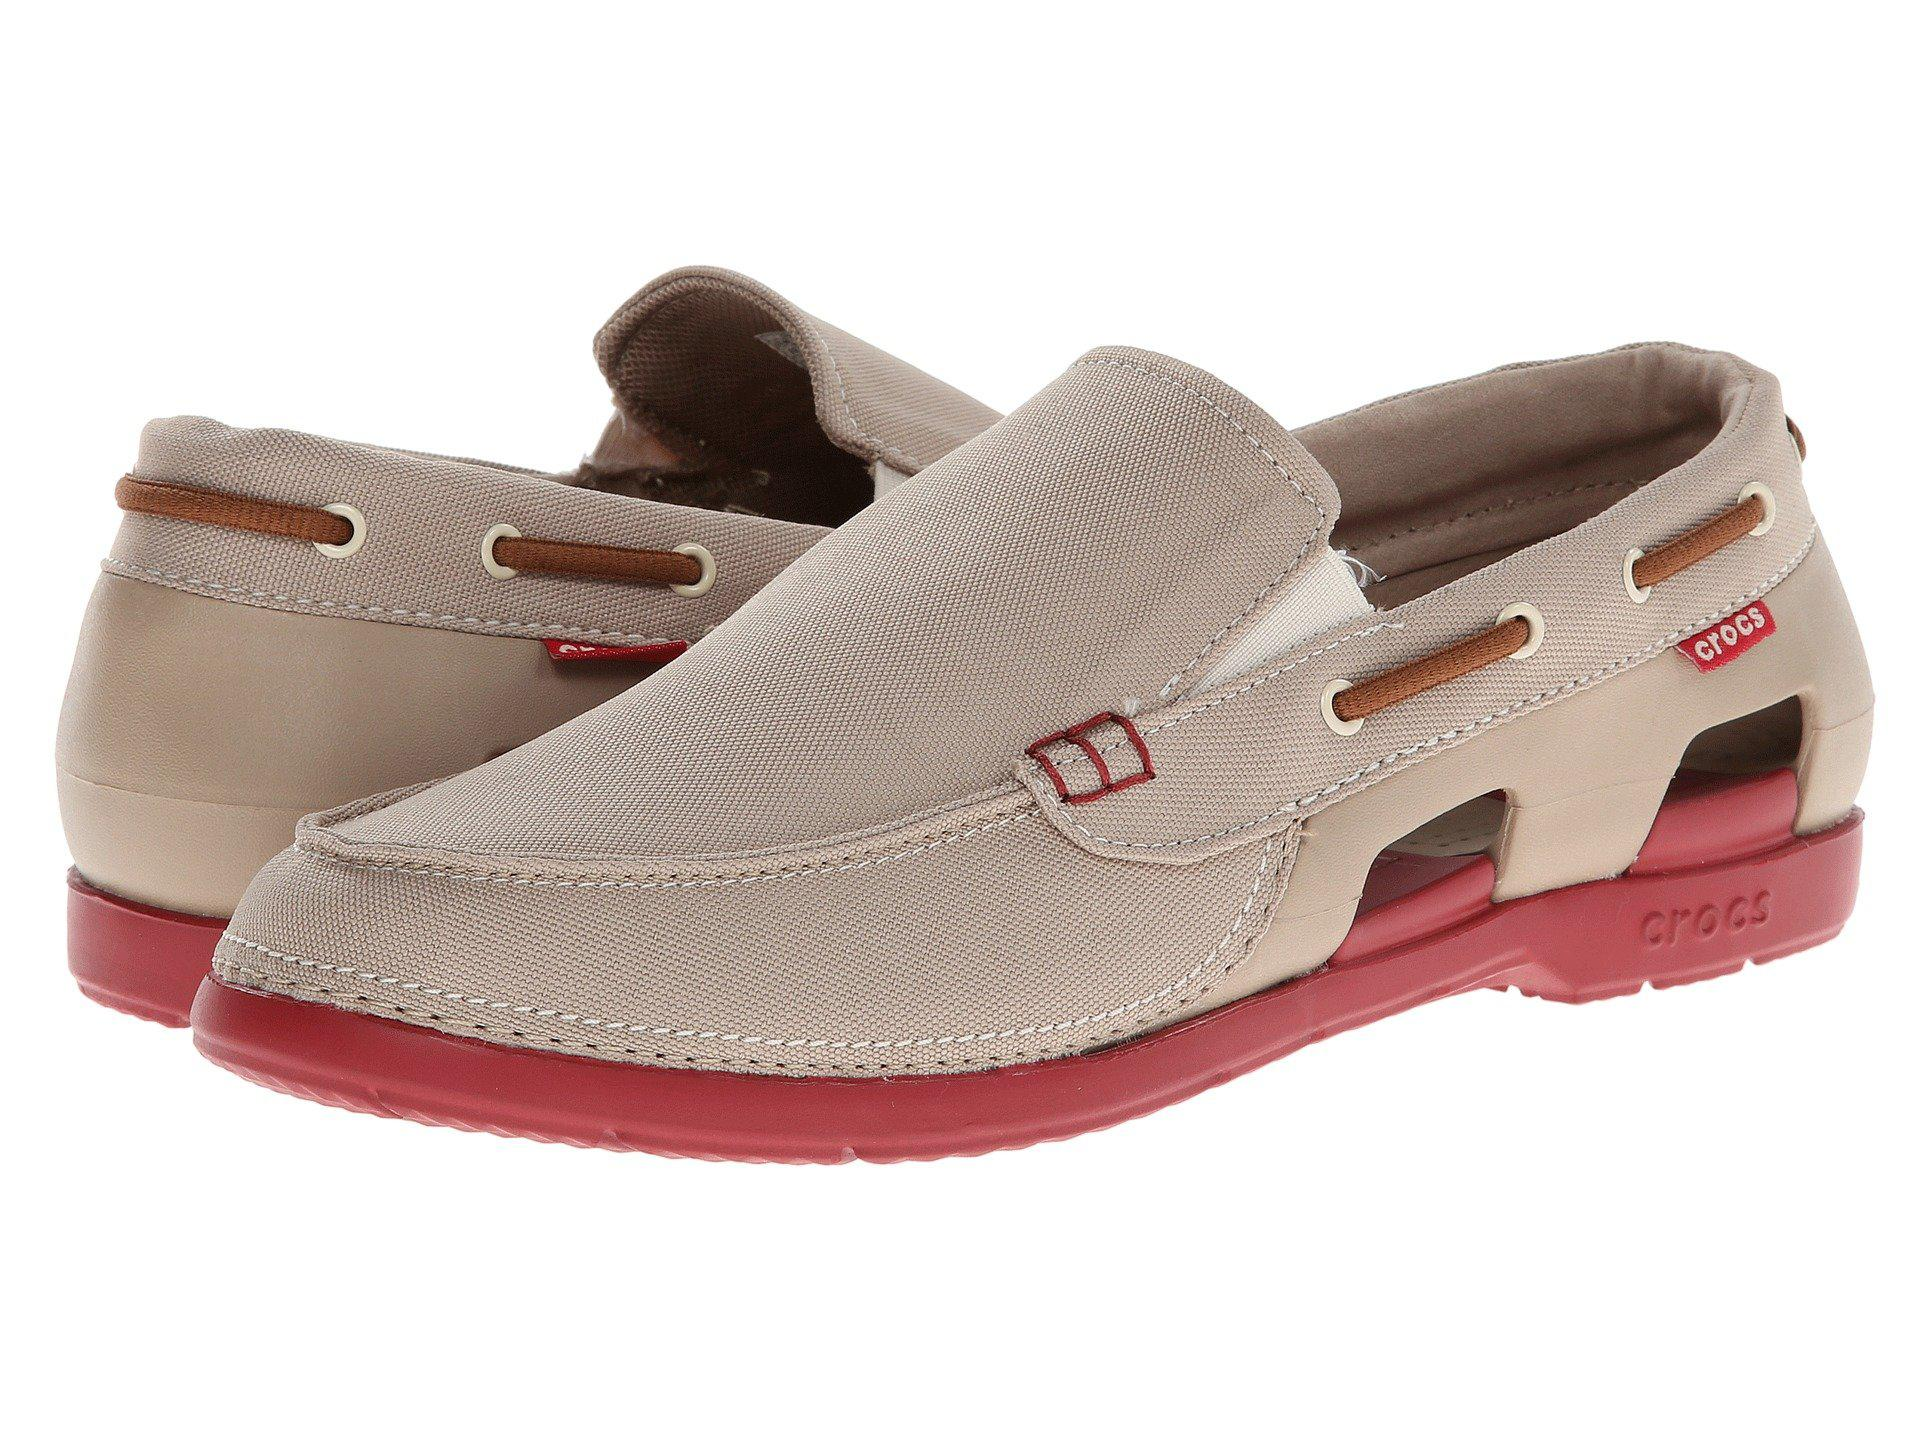 c5672a18c Lyst - Crocs™ Beach Line Boat Slip for Men